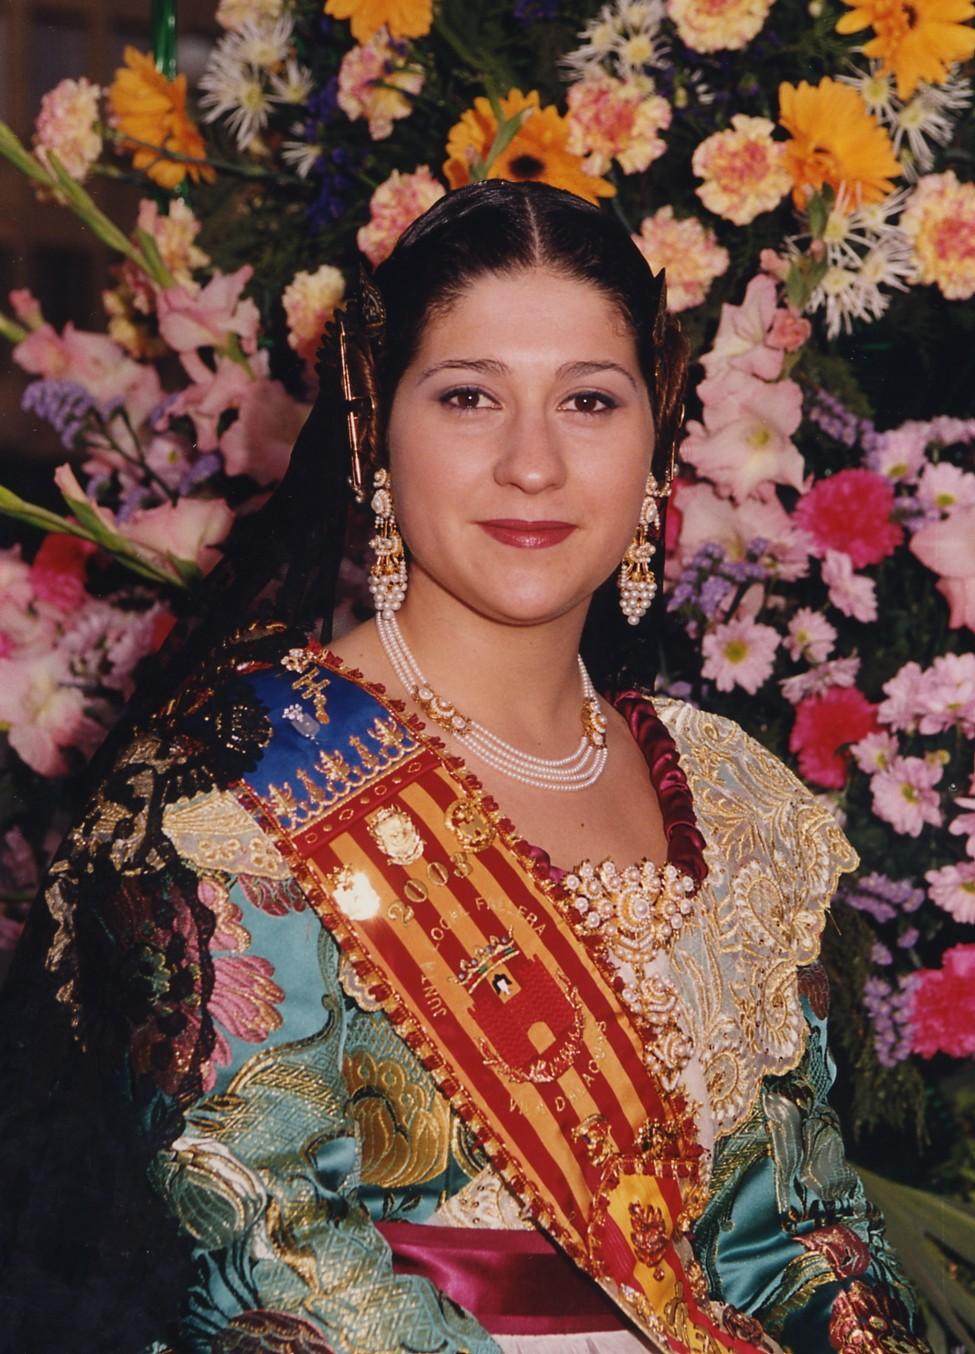 leticia garcia alvarez: